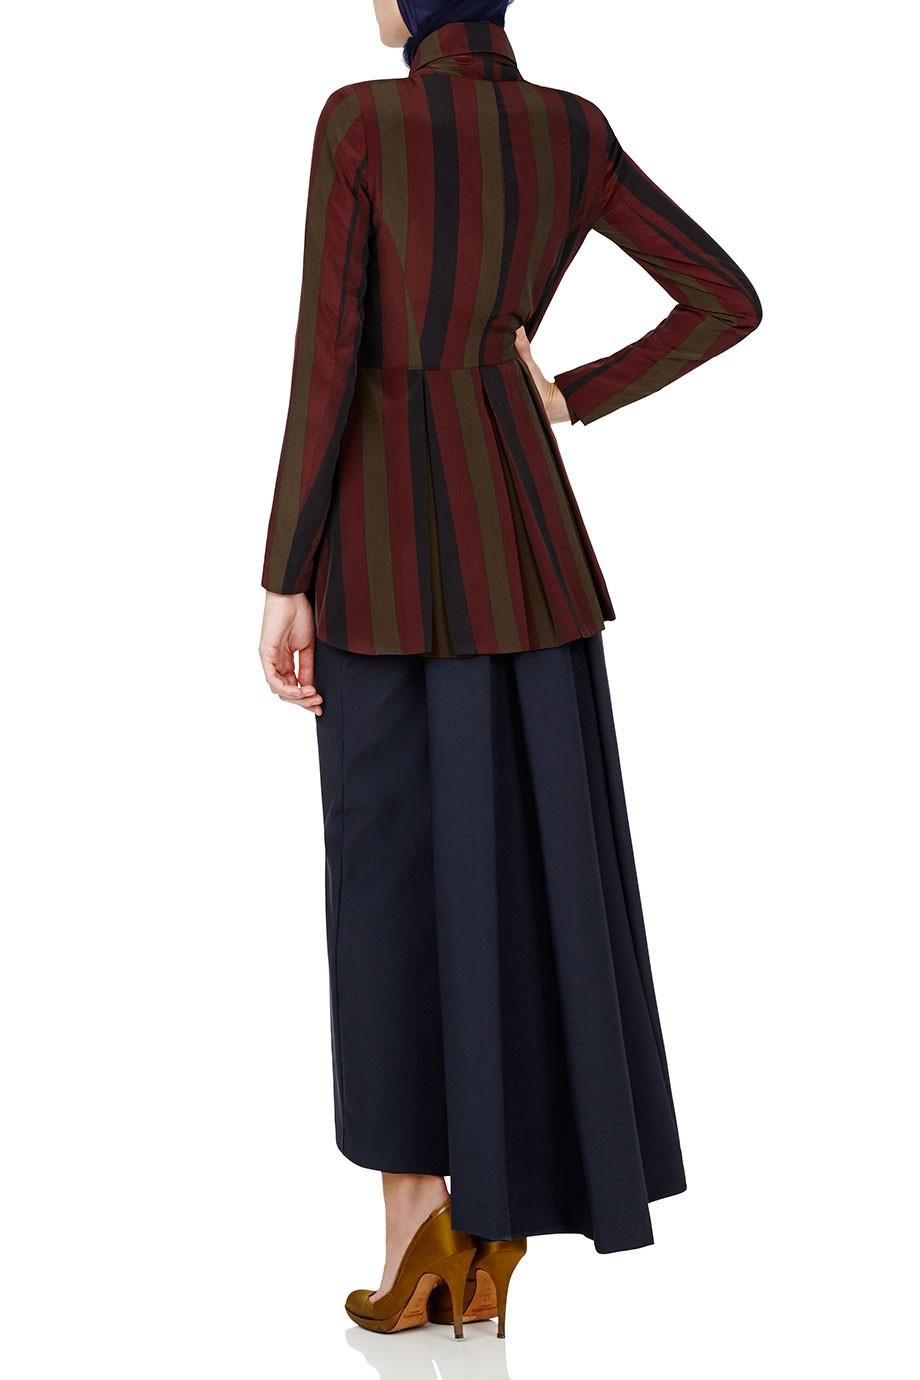 Diana-Kotb-Atlas-Jacket-Stripe-Time-Piece-Skirt-Navy-02